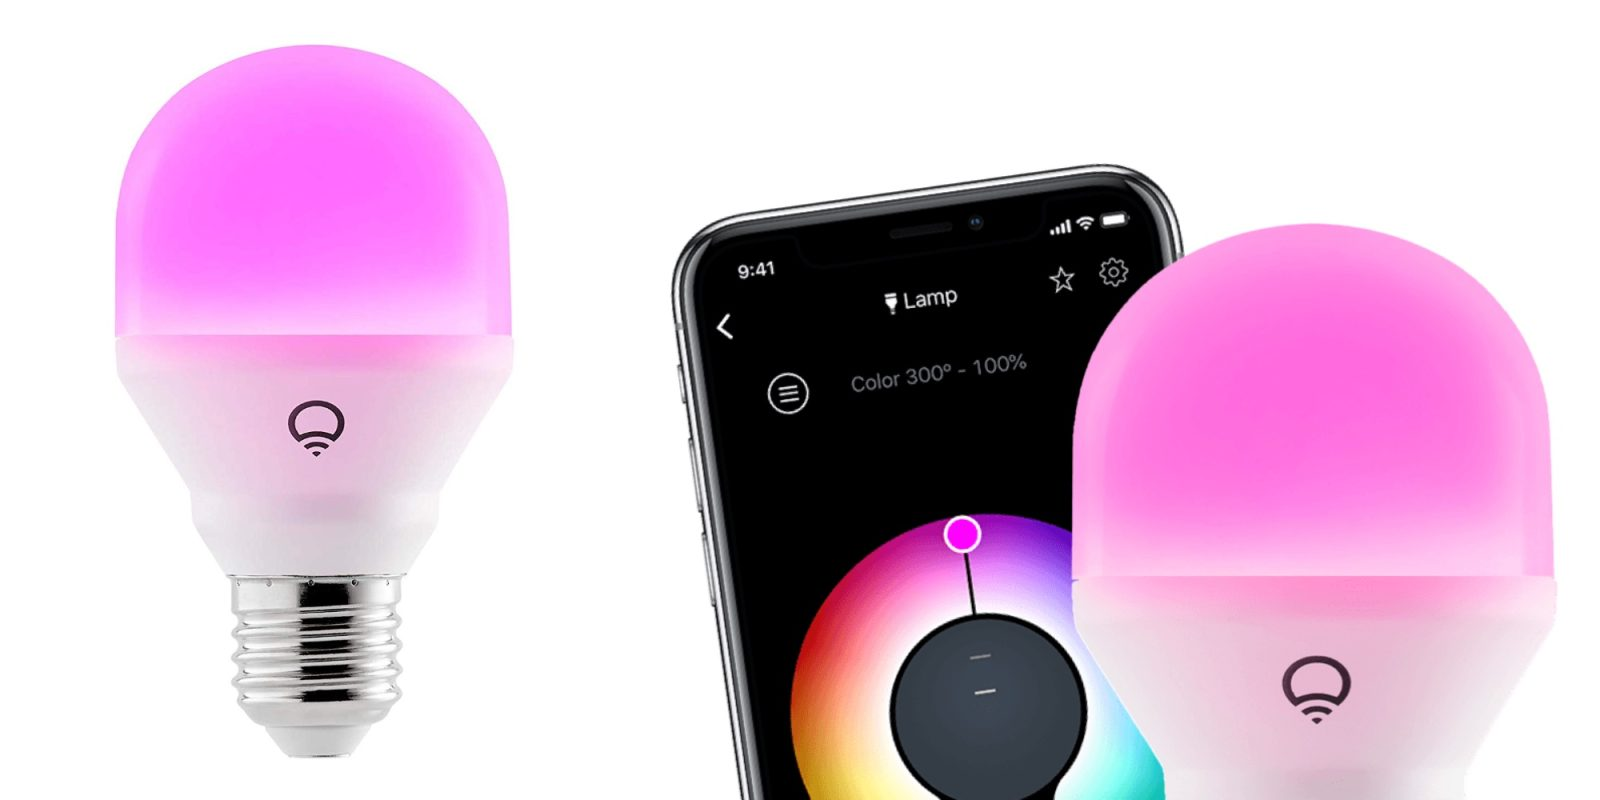 HomeKit control highlights LIFX's Mini Color Light Bulb at $35 (Save 23%)